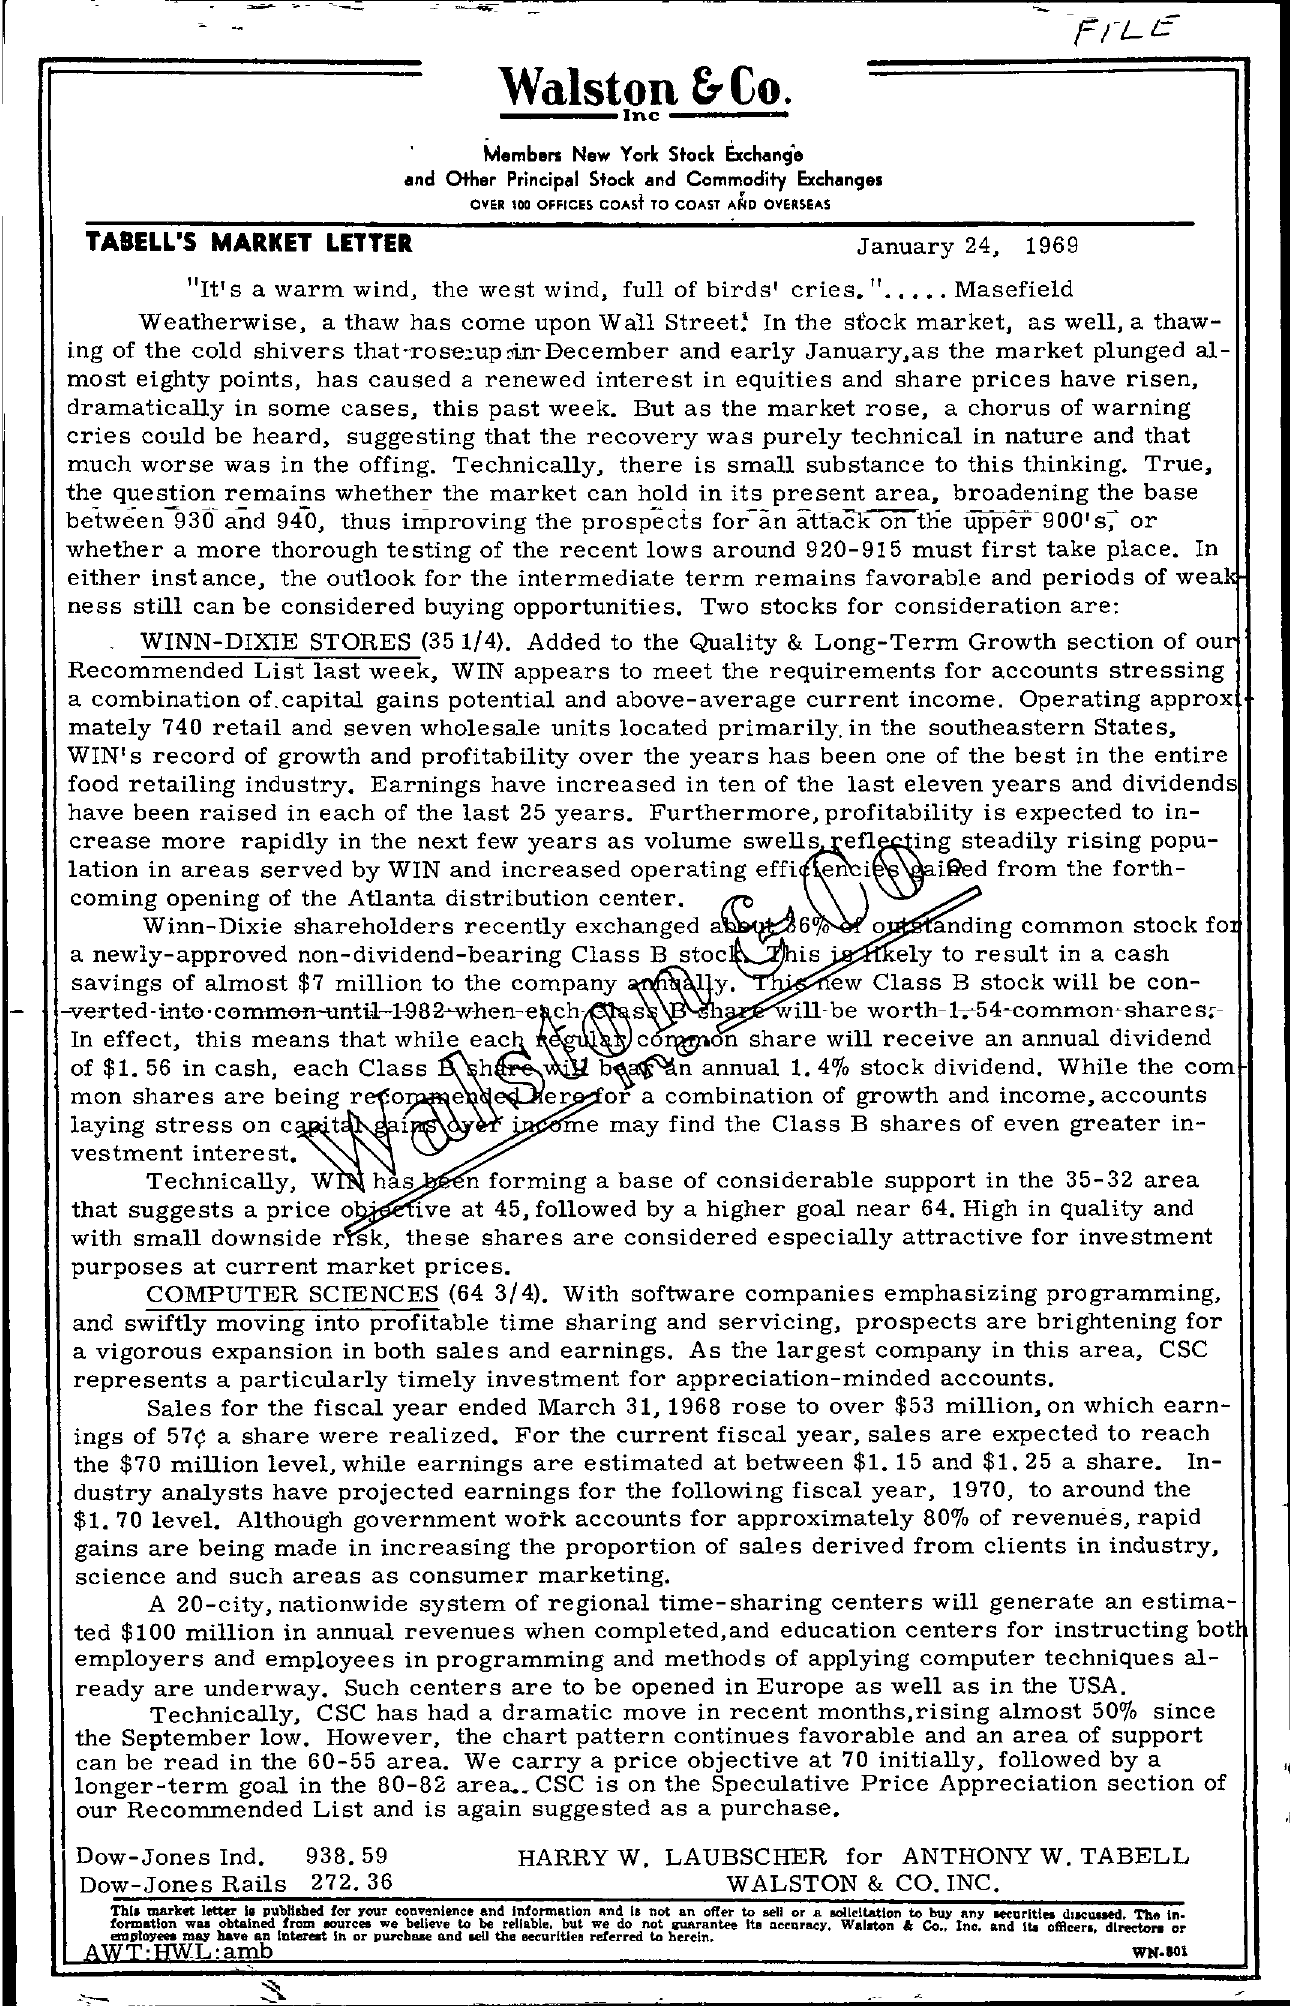 Tabell's Market Letter - January 24, 1969